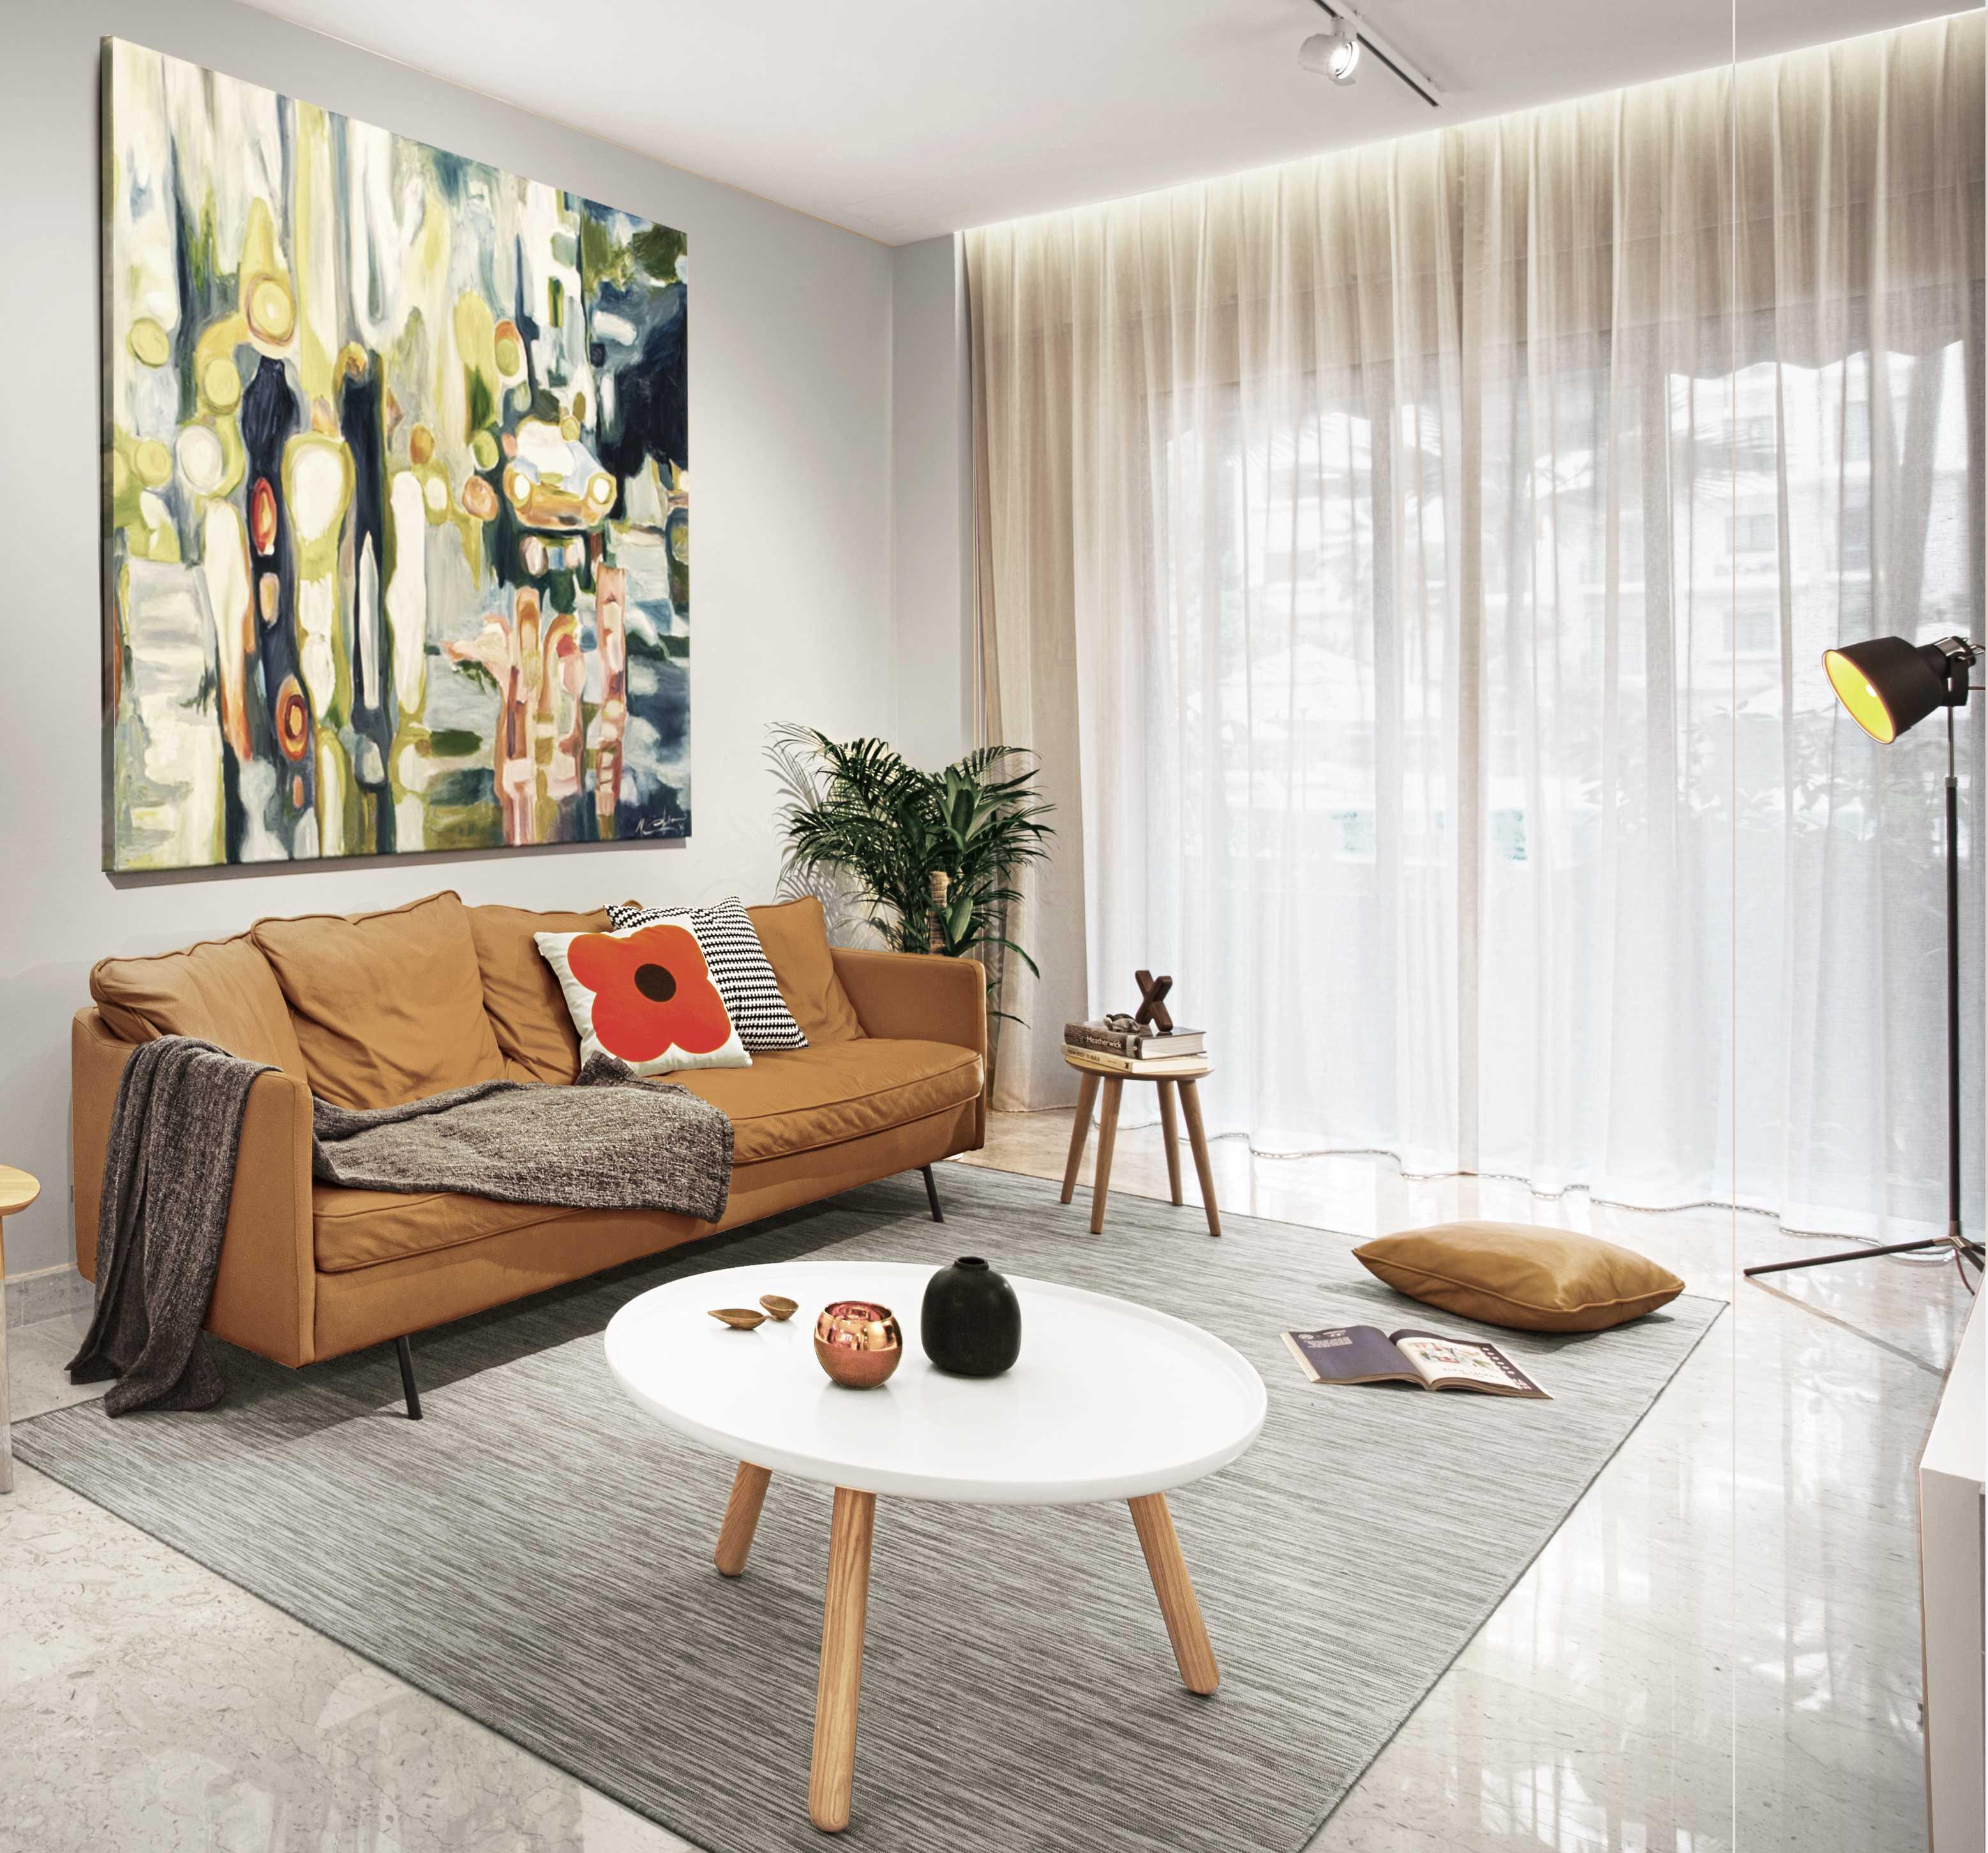 Studio Dinding Project A Residence Indonesia  Living-Room Skandinavia  34523